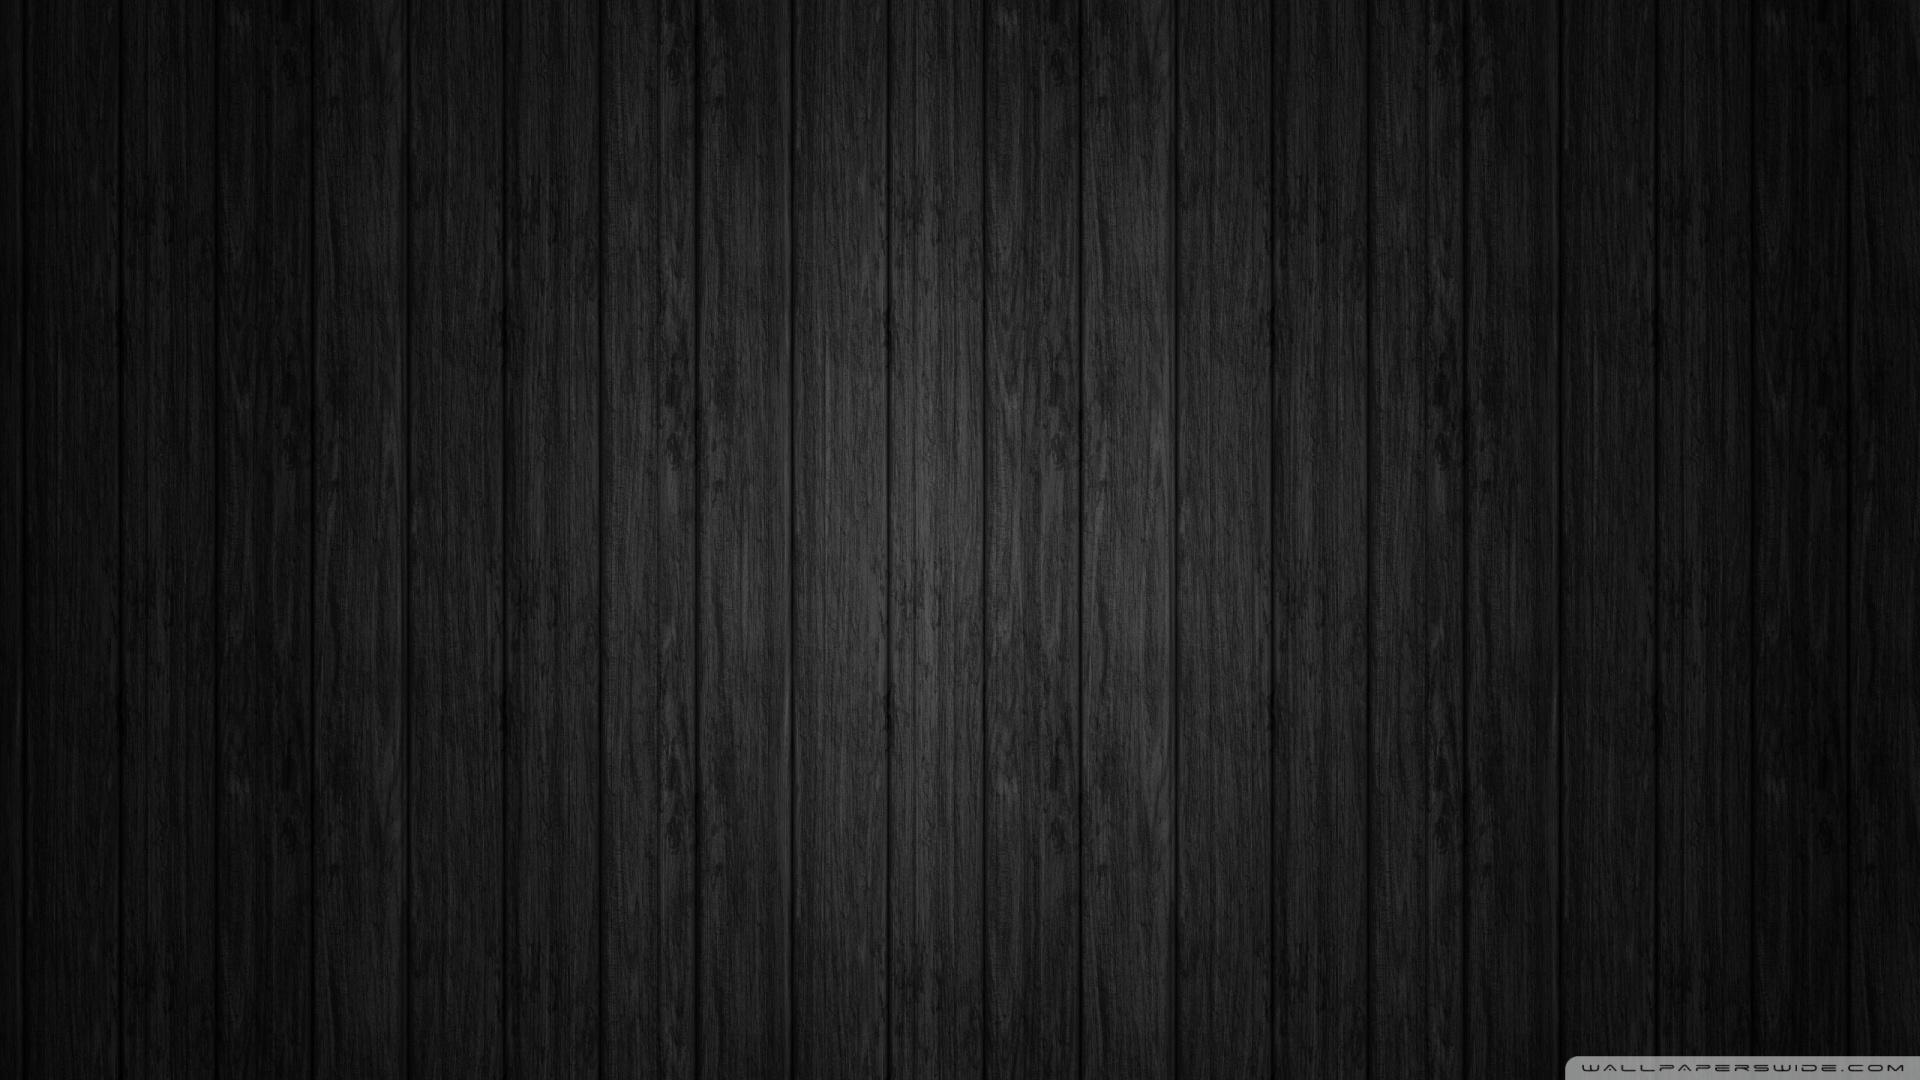 red-black-wallpaper-wp6409011. Rattle-n-Hum-Craft-Beer-Bars-Irish-Bars-